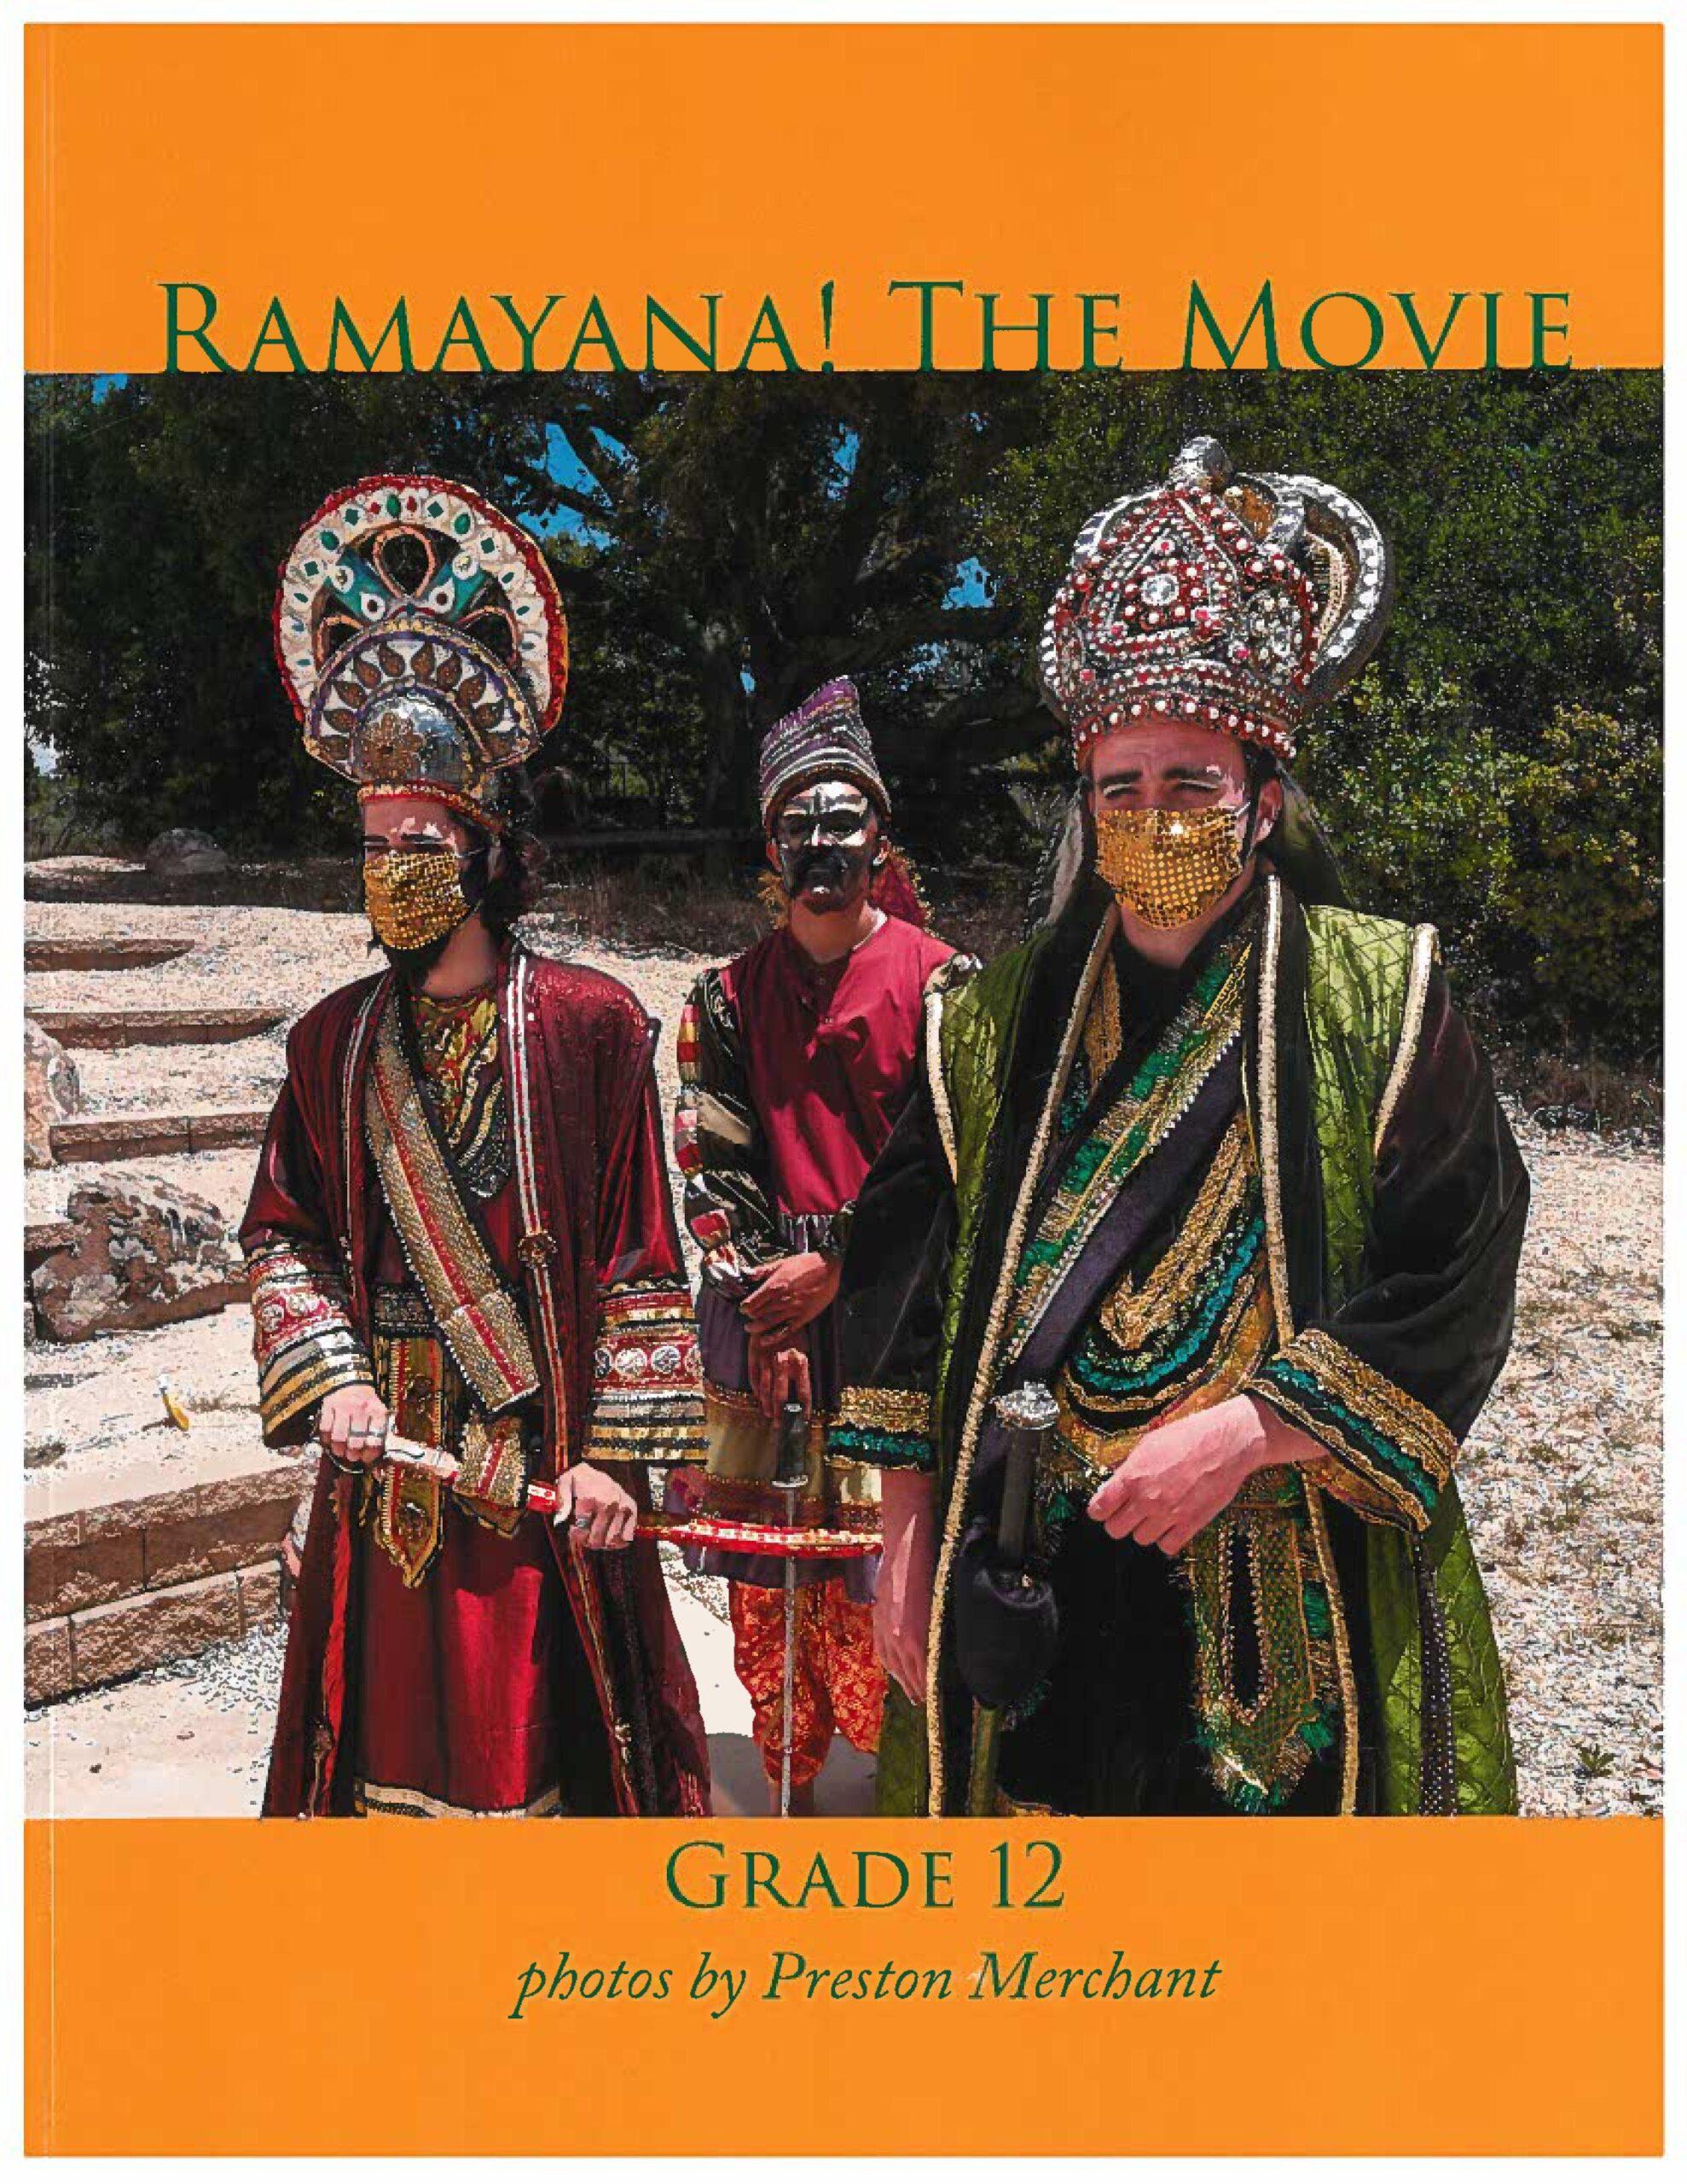 2021 12th Grade <i>Ramayana!</i> Photo Book